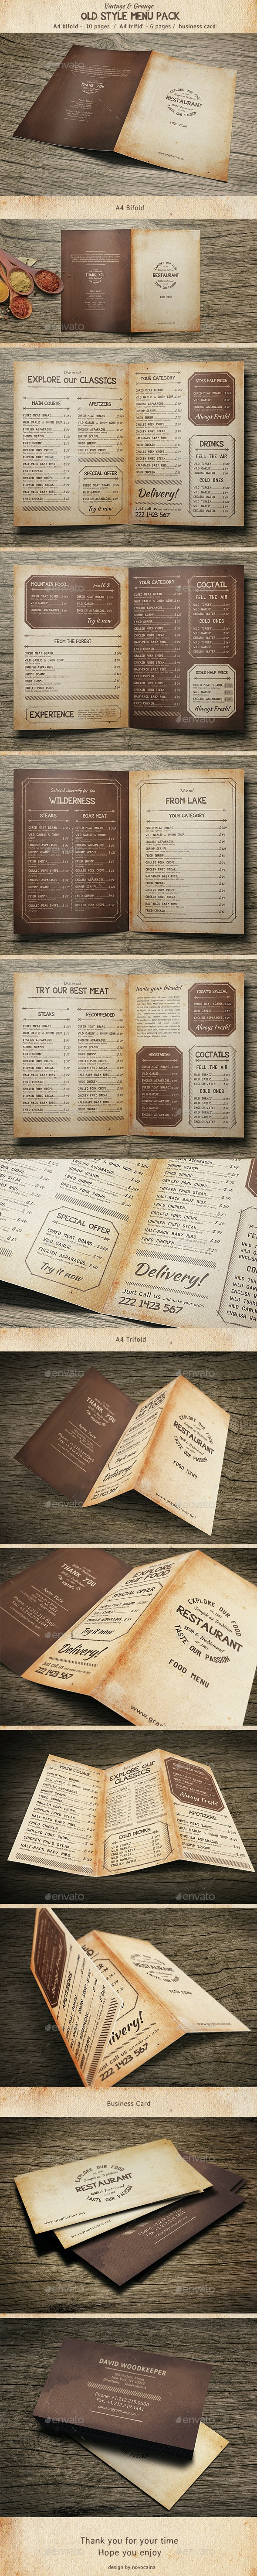 Old Style Menu Pack - Food Menus Print Templates